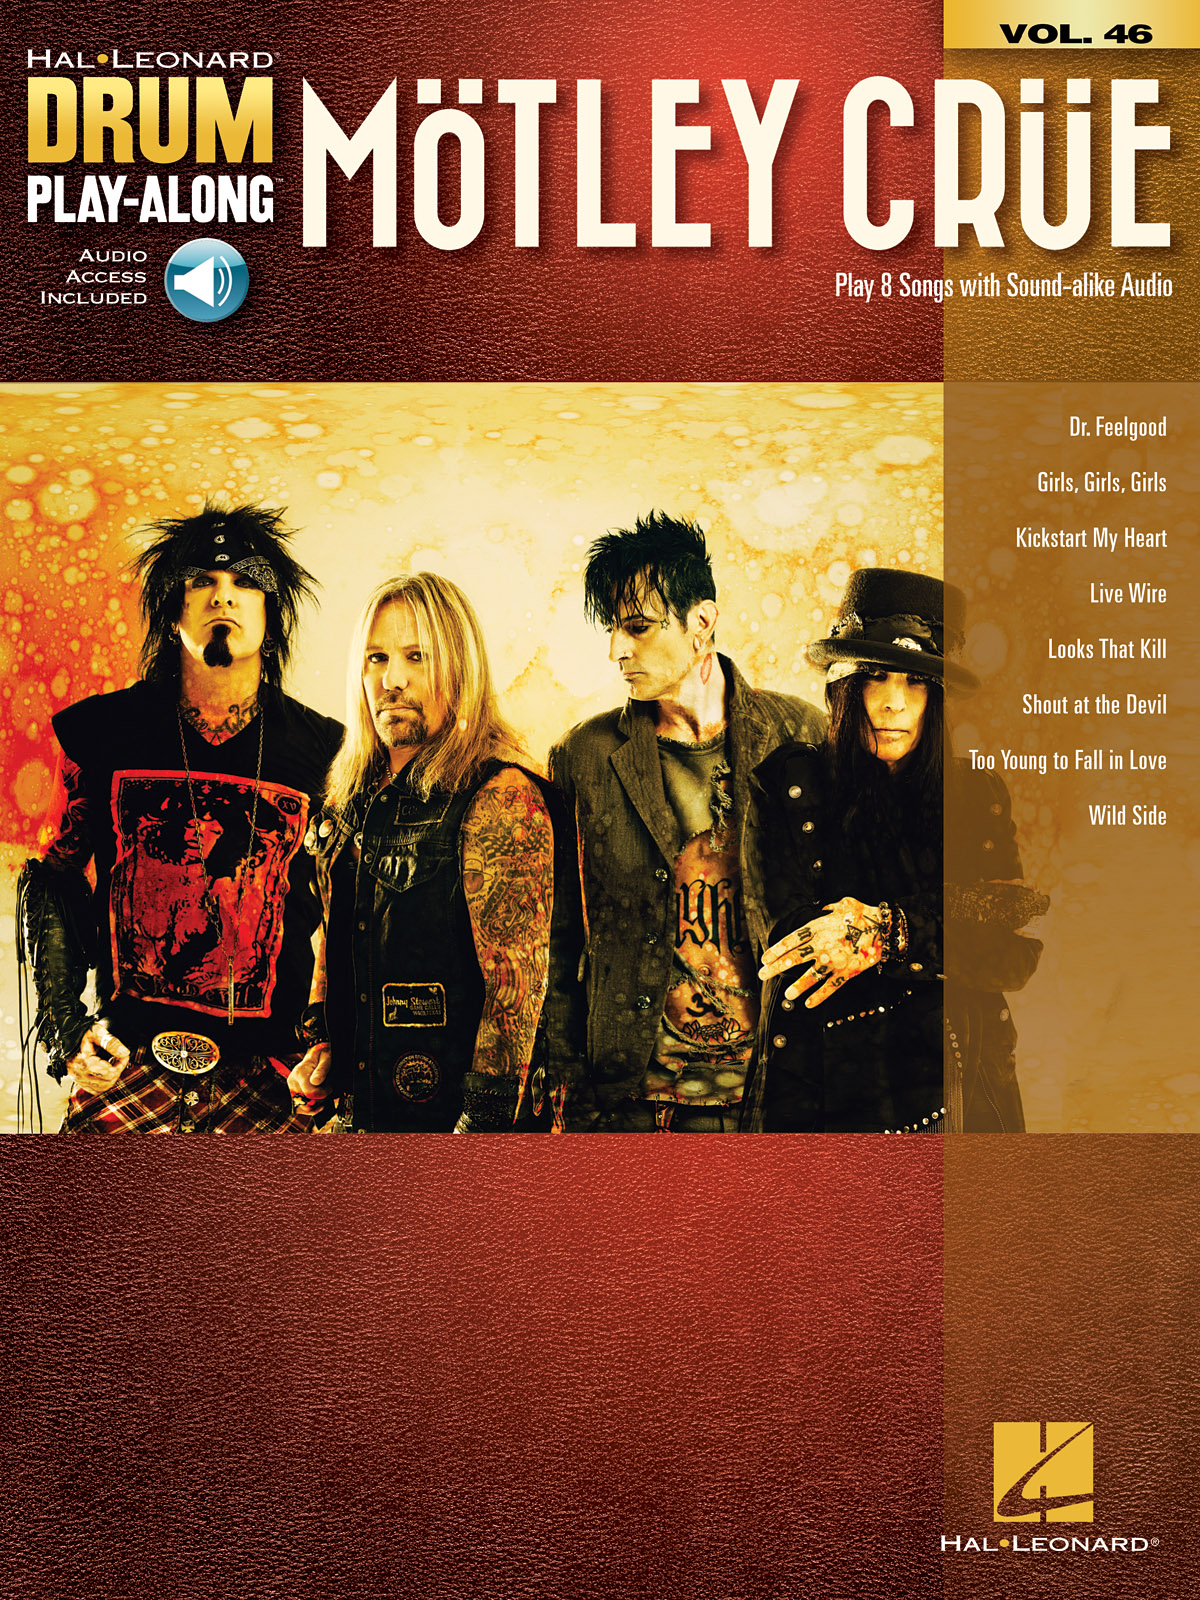 Blink-182: Mötley Crüe: Drums: Instrumental Album